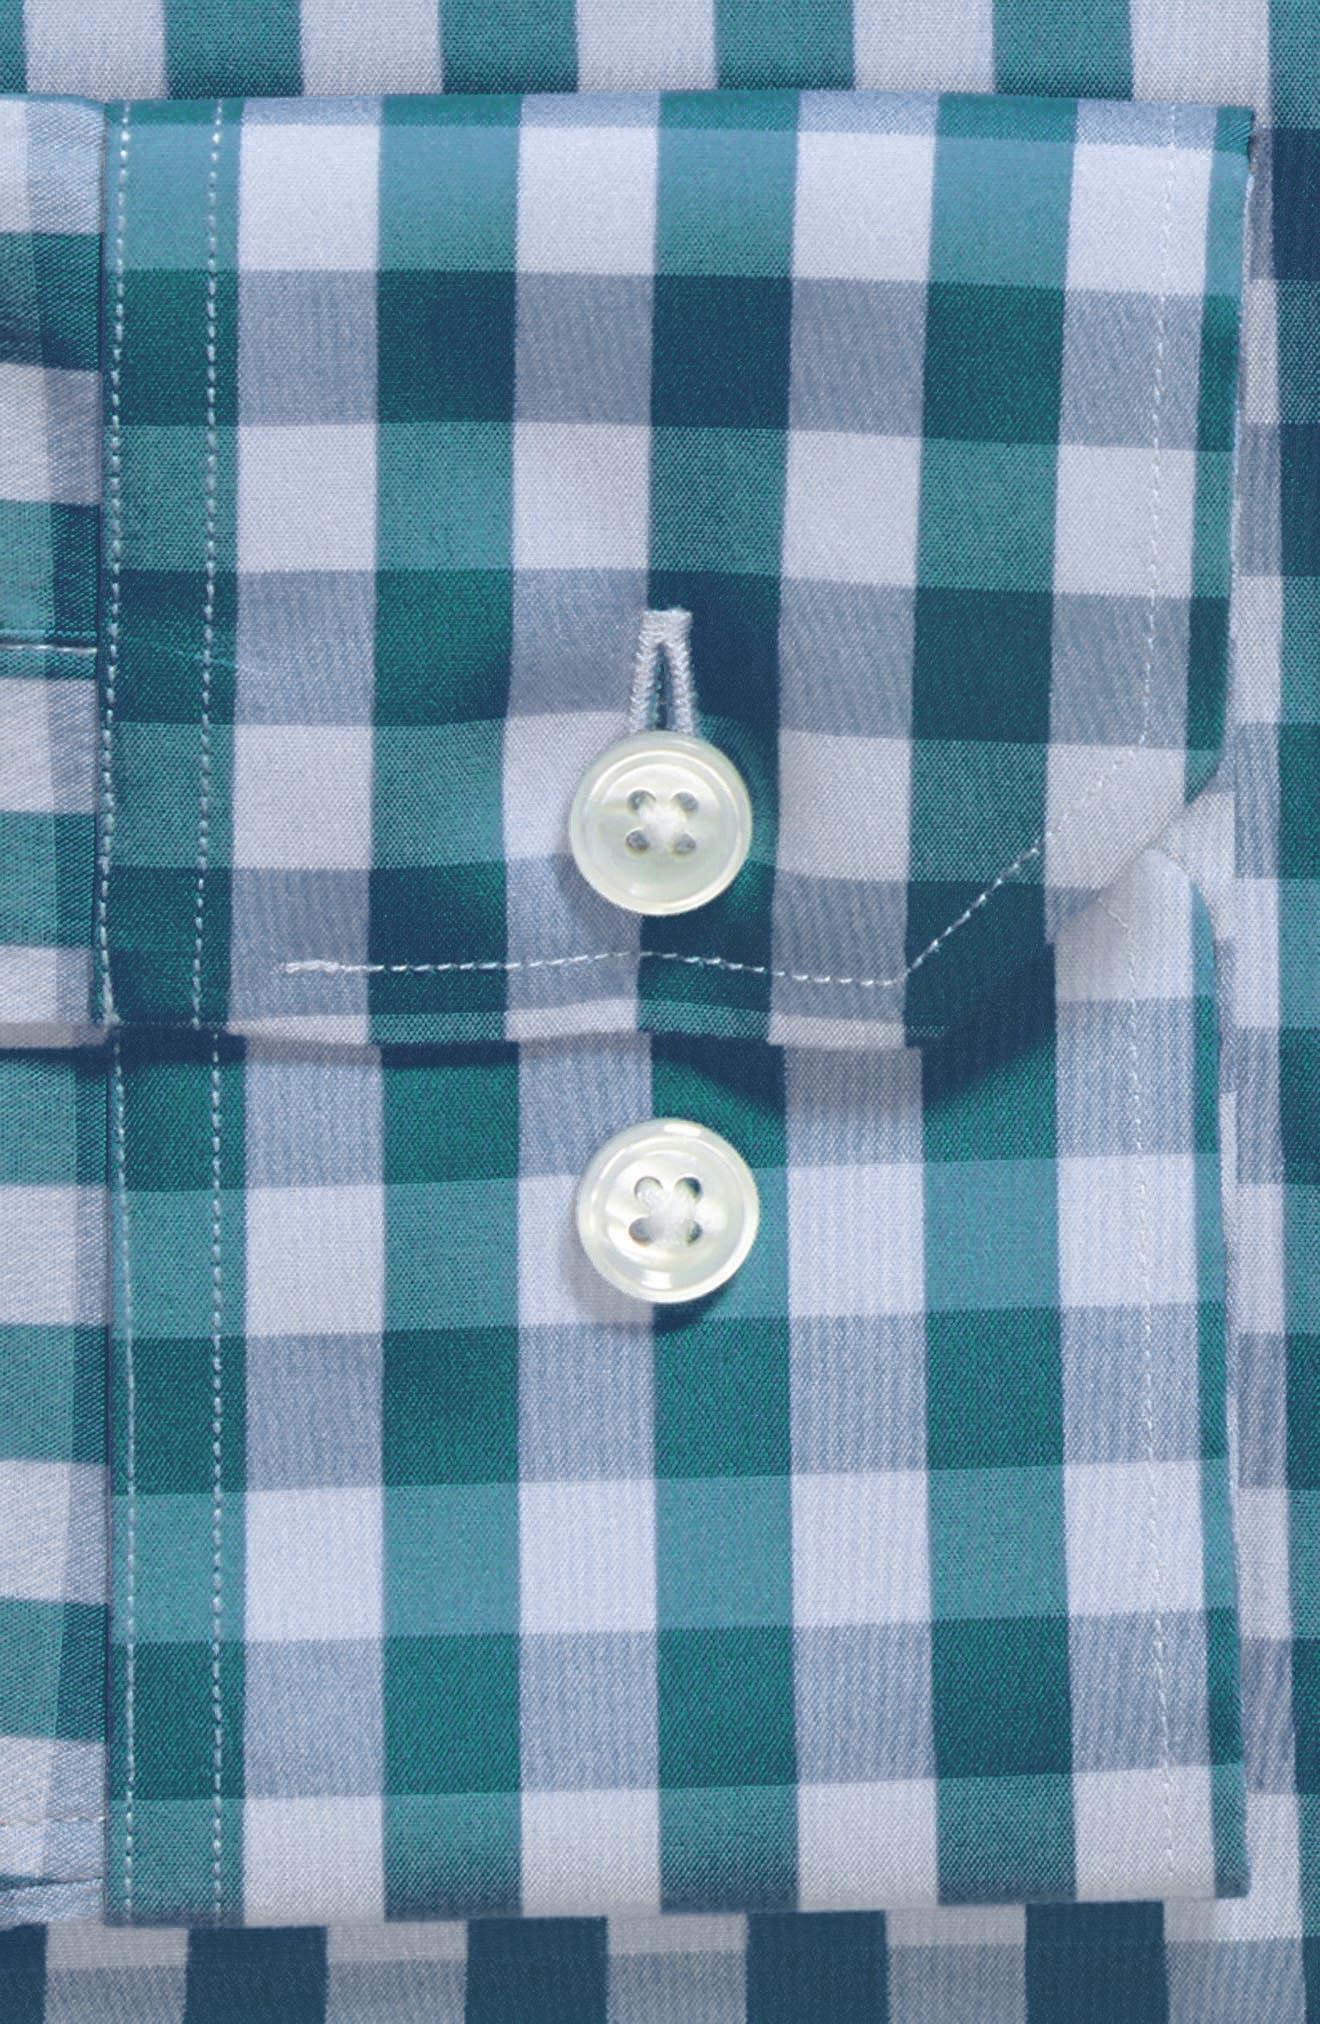 Port Grand Slim Fit Stretch Check Dress Shirt,                             Alternate thumbnail 6, color,                             TEAL